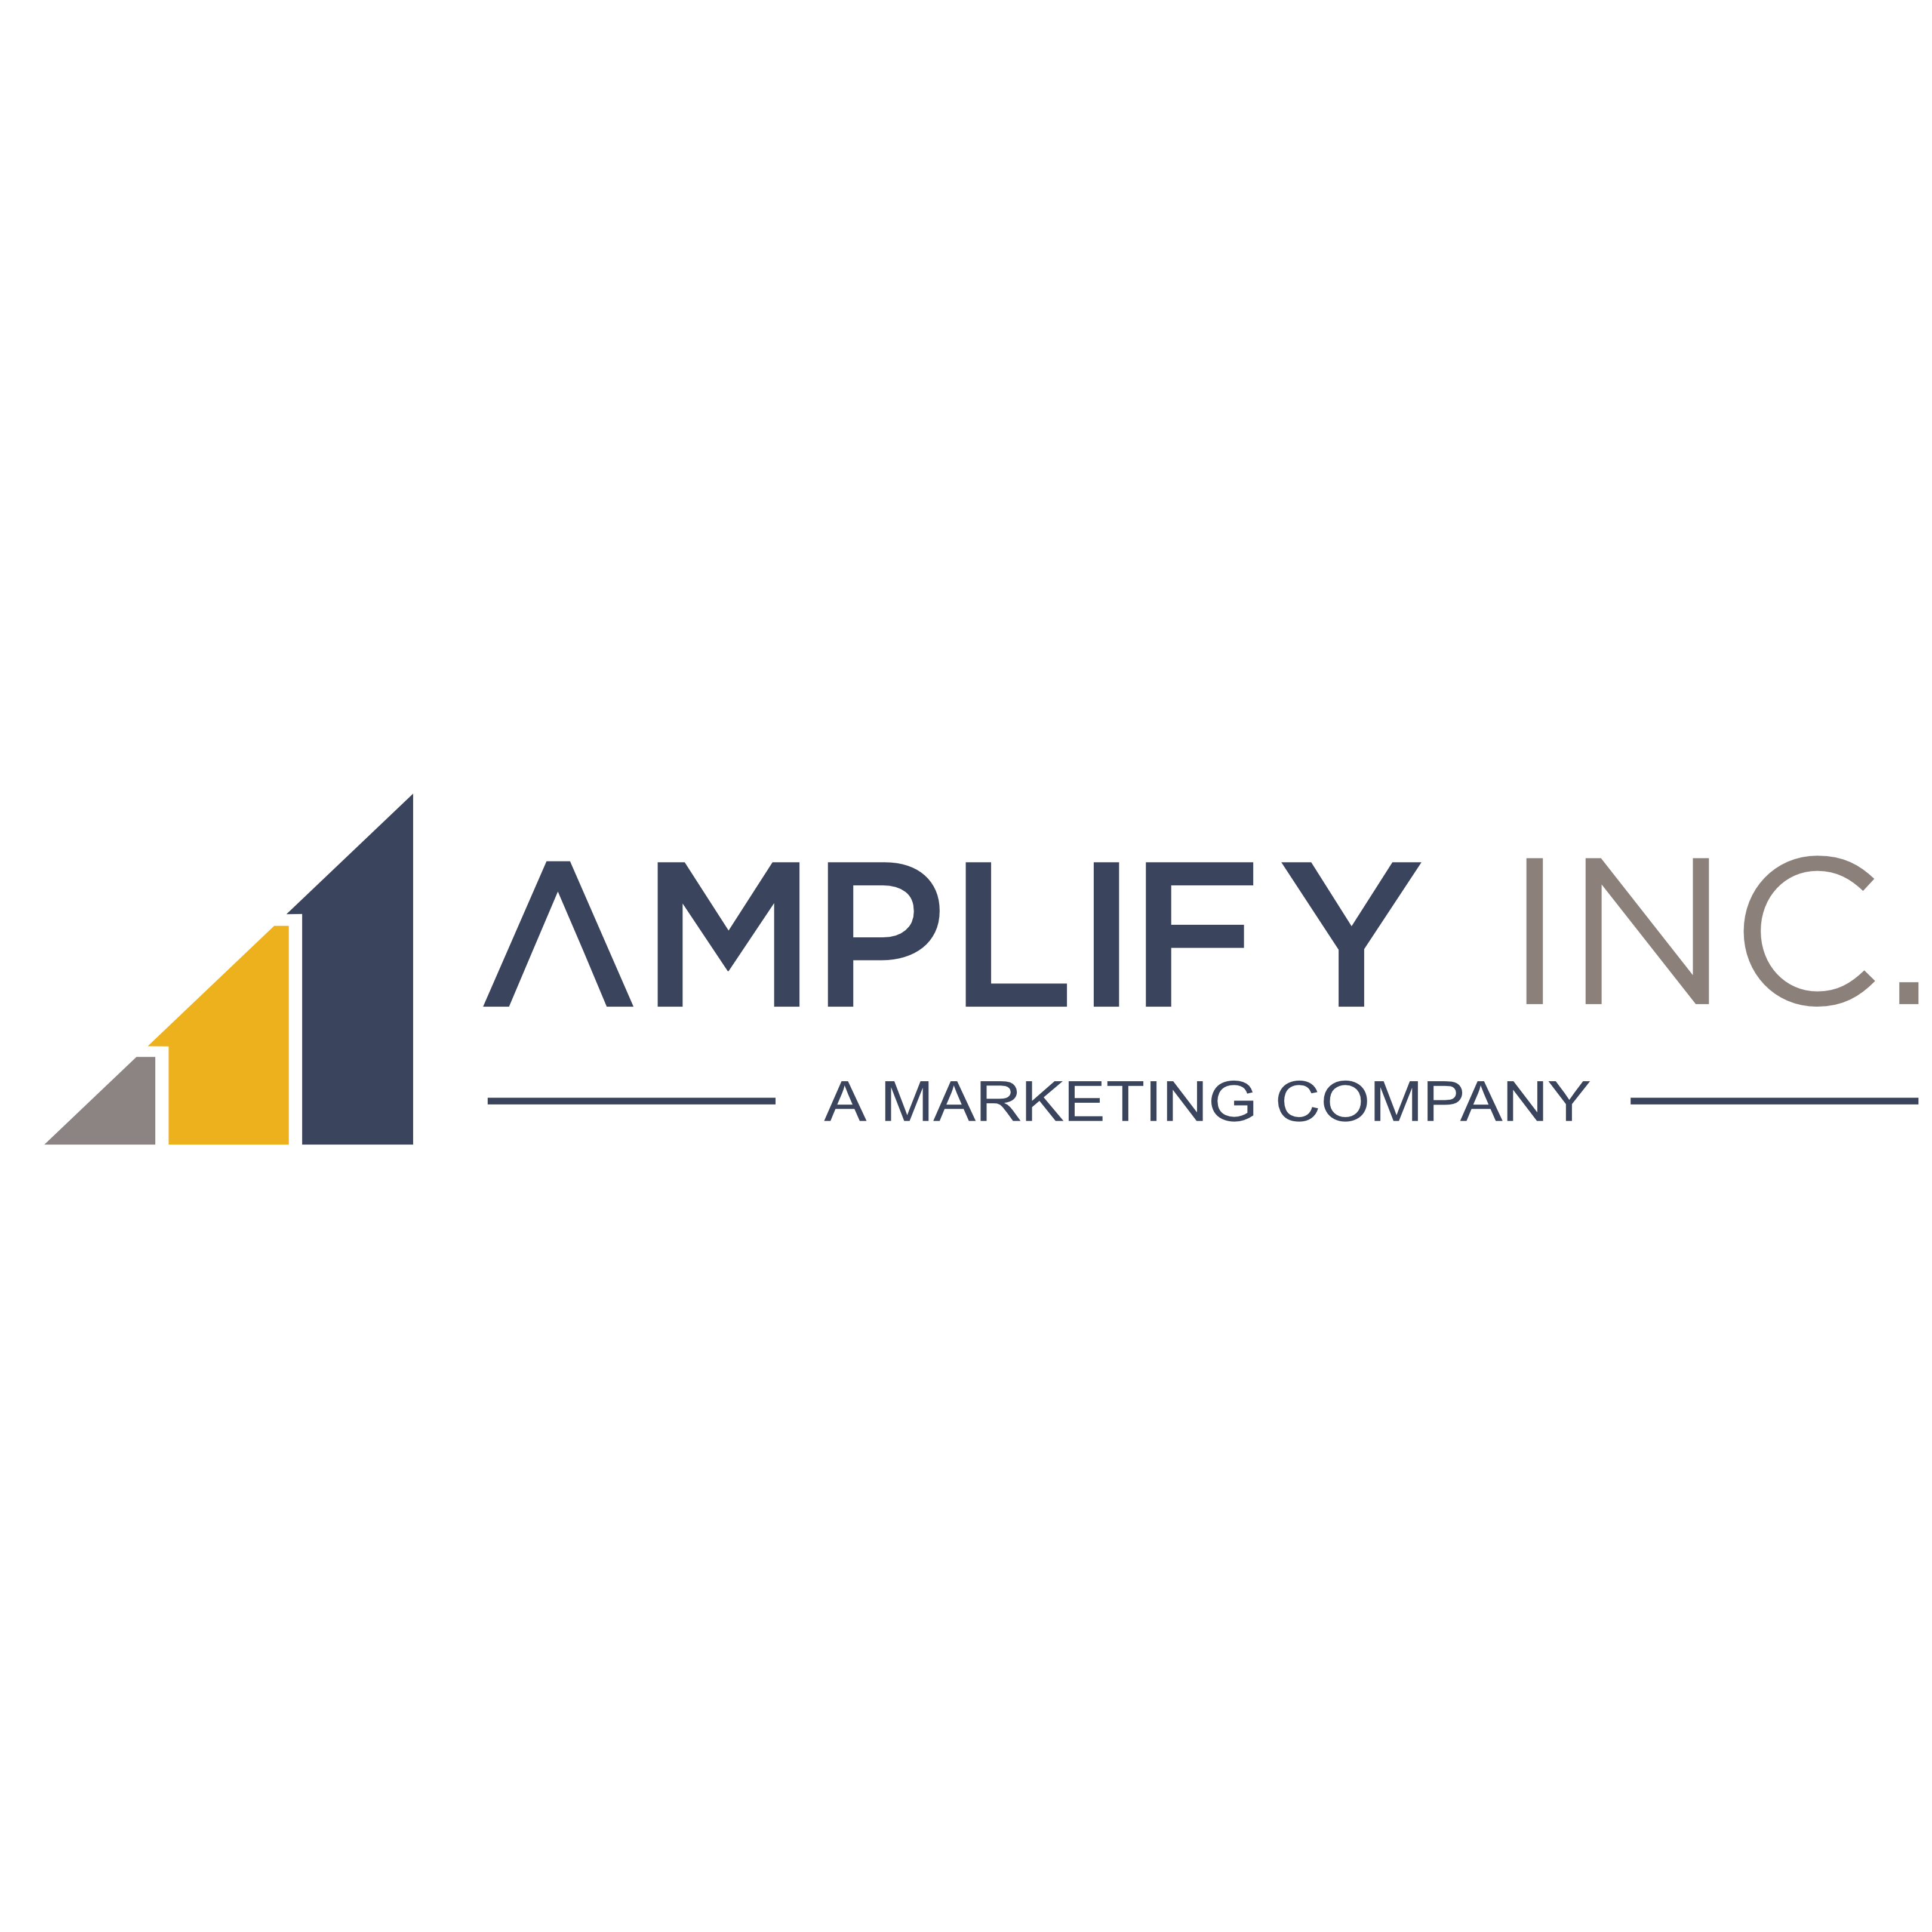 Amplify Inc image 1